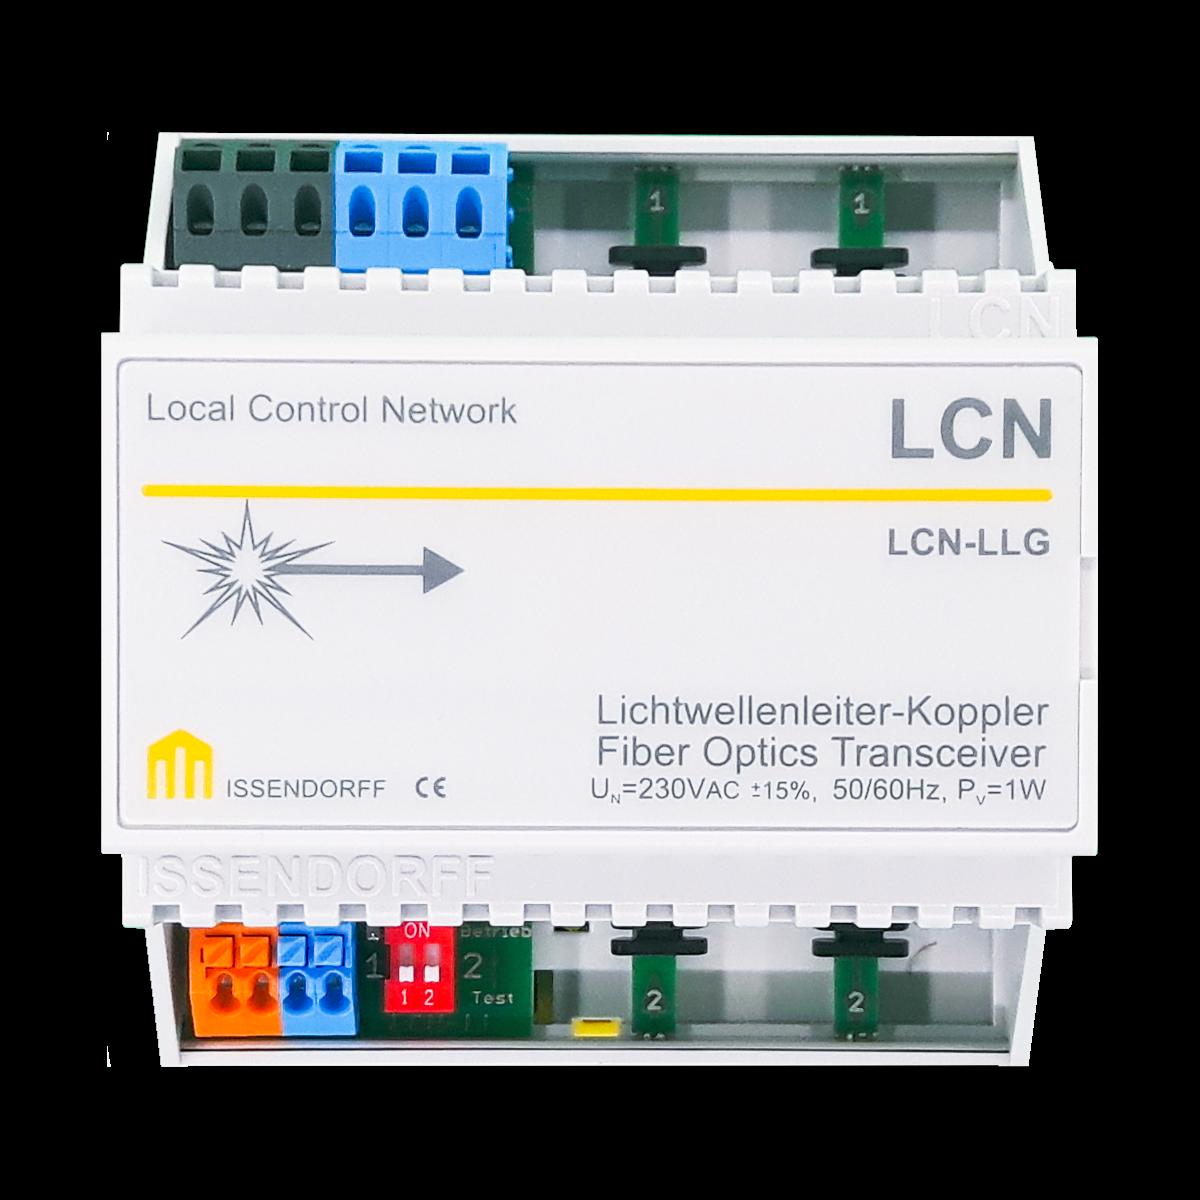 LCN-LLG